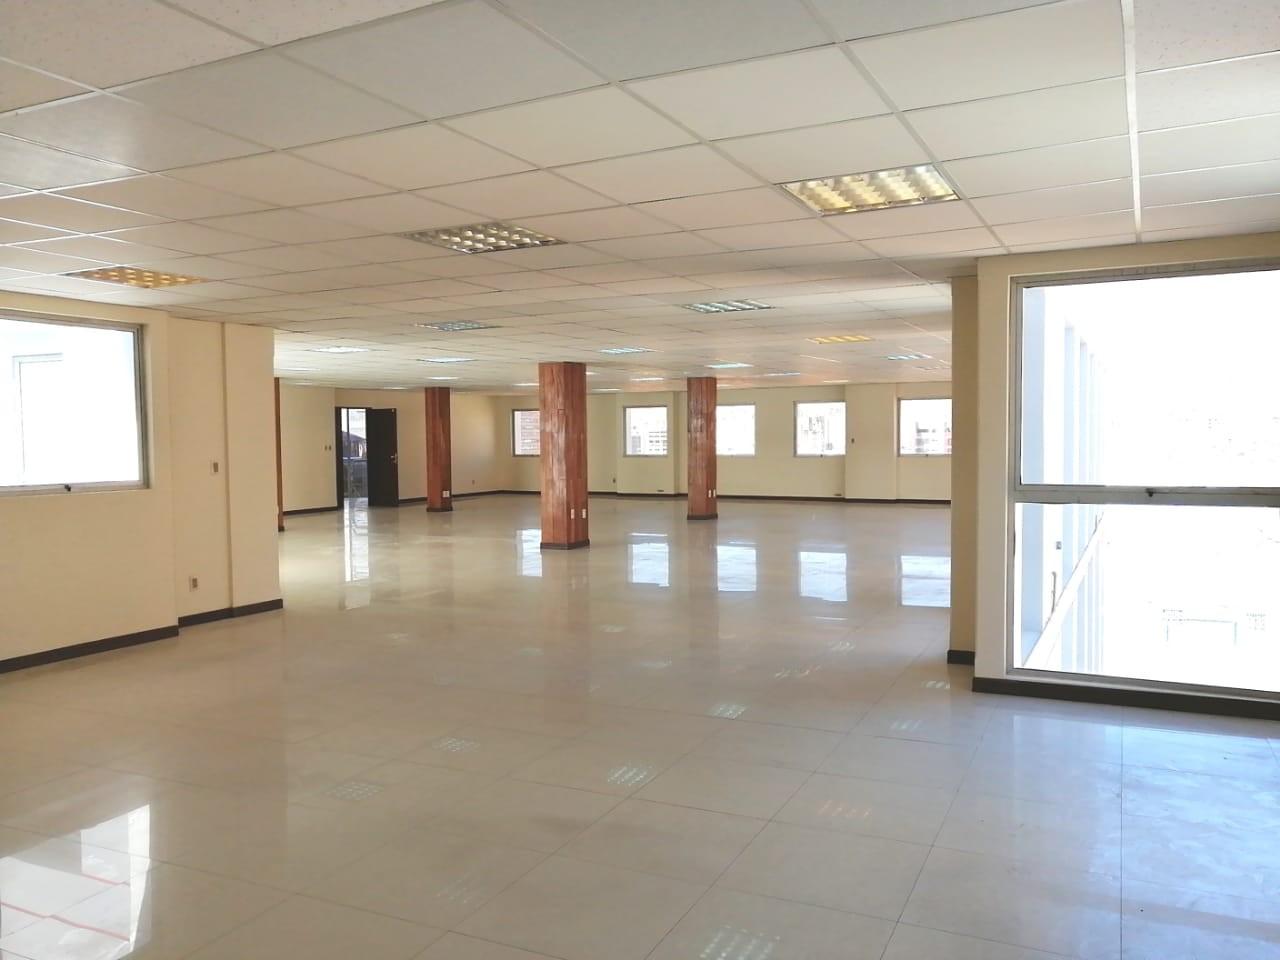 Oficina en Alquiler OFICINA EN ALQUILER 300 mtrs  CALLE SUCRE Foto 1